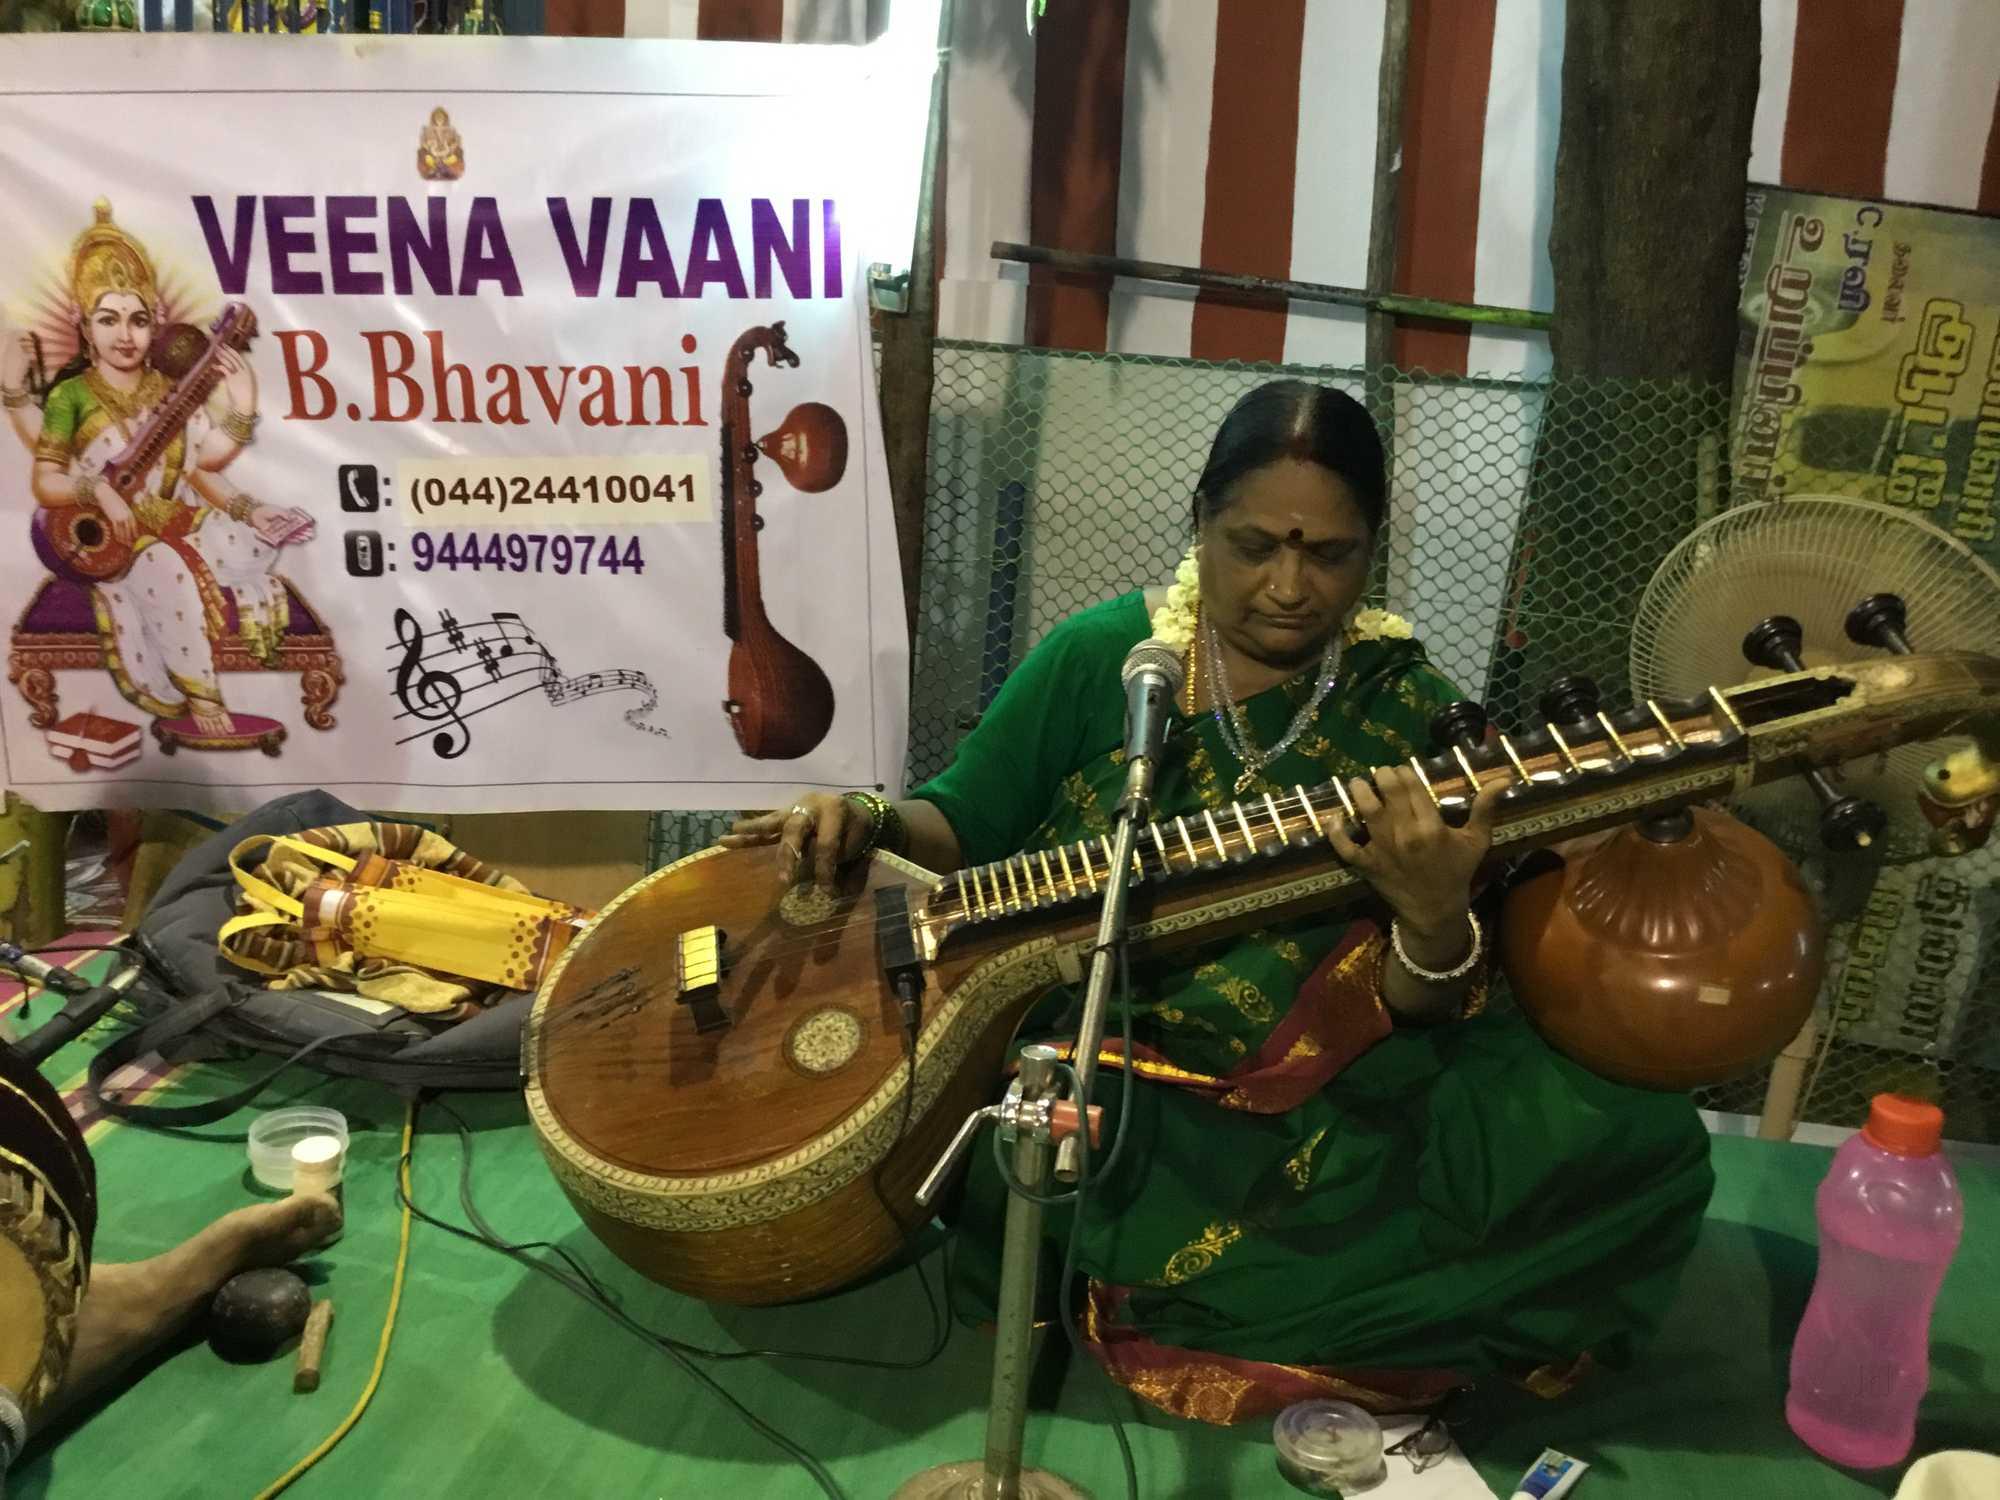 Top Music Classes For Veena At Home in Anna Nagar, Chennai